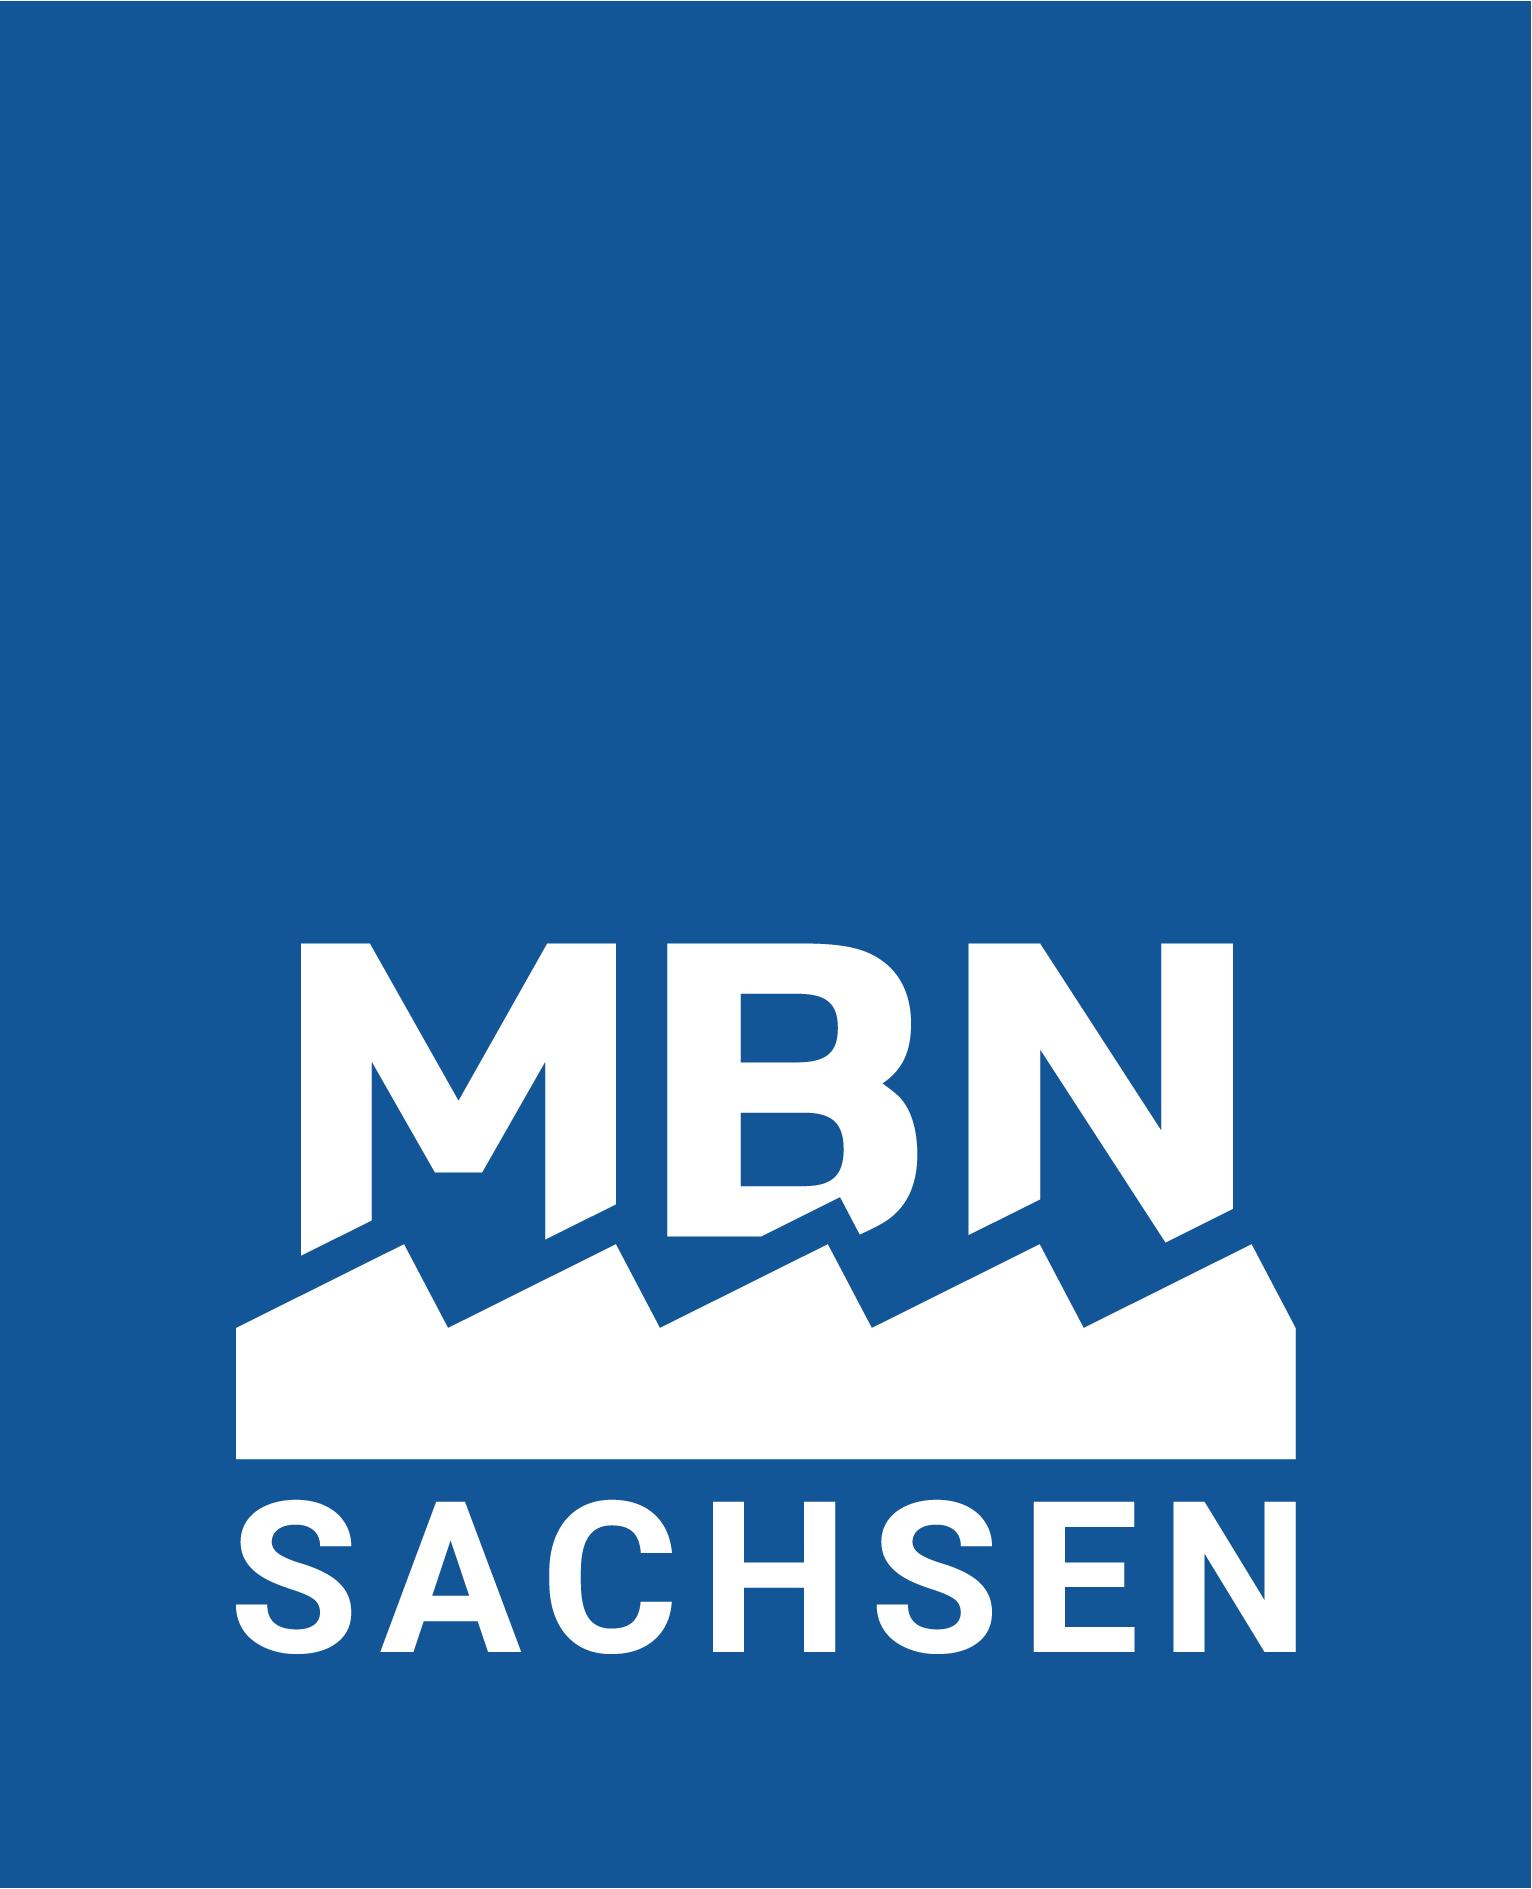 MBN – Maschinenbaubetriebe Neugersdorf GmbH